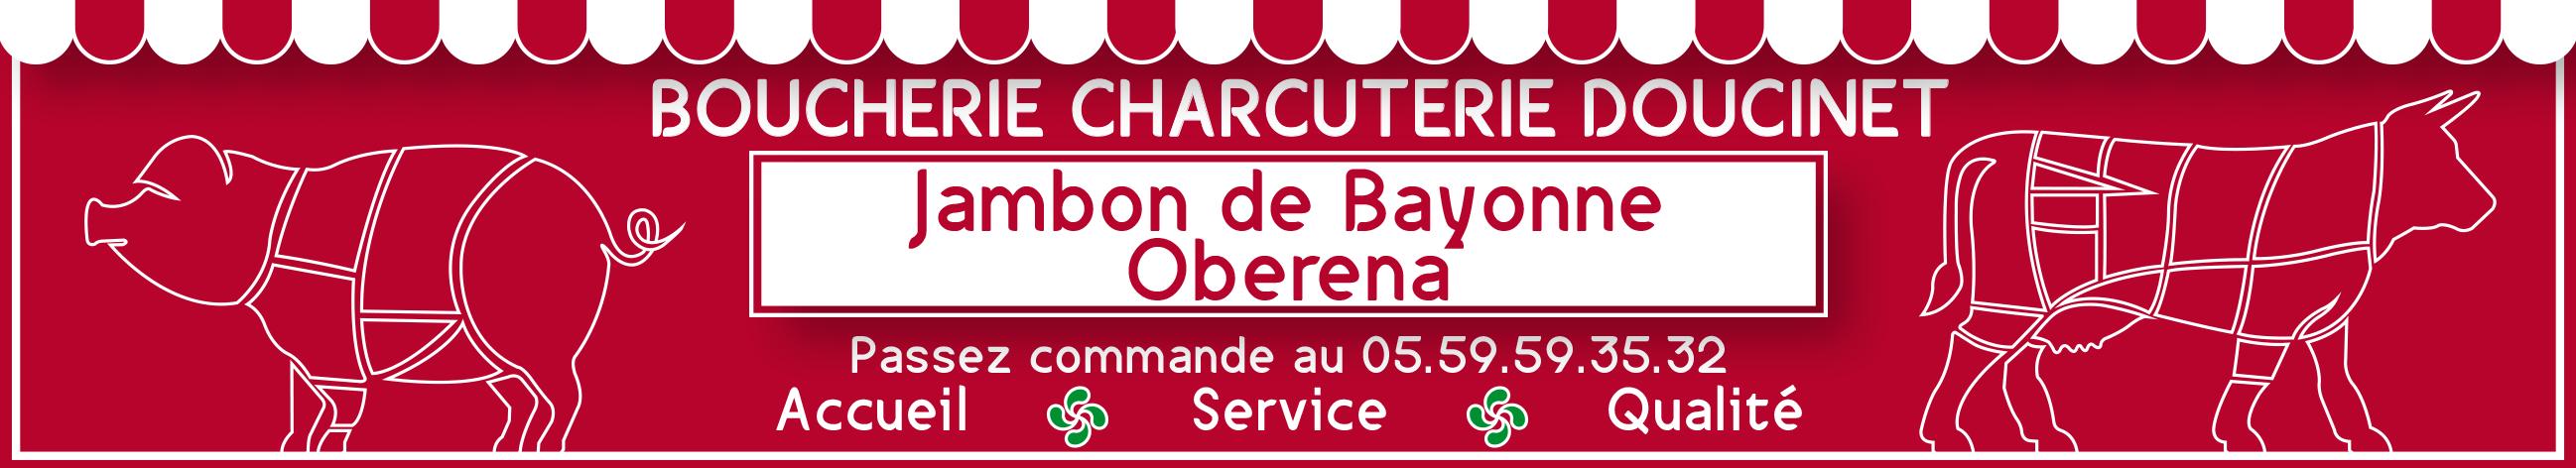 Boucherie doucinet1.png